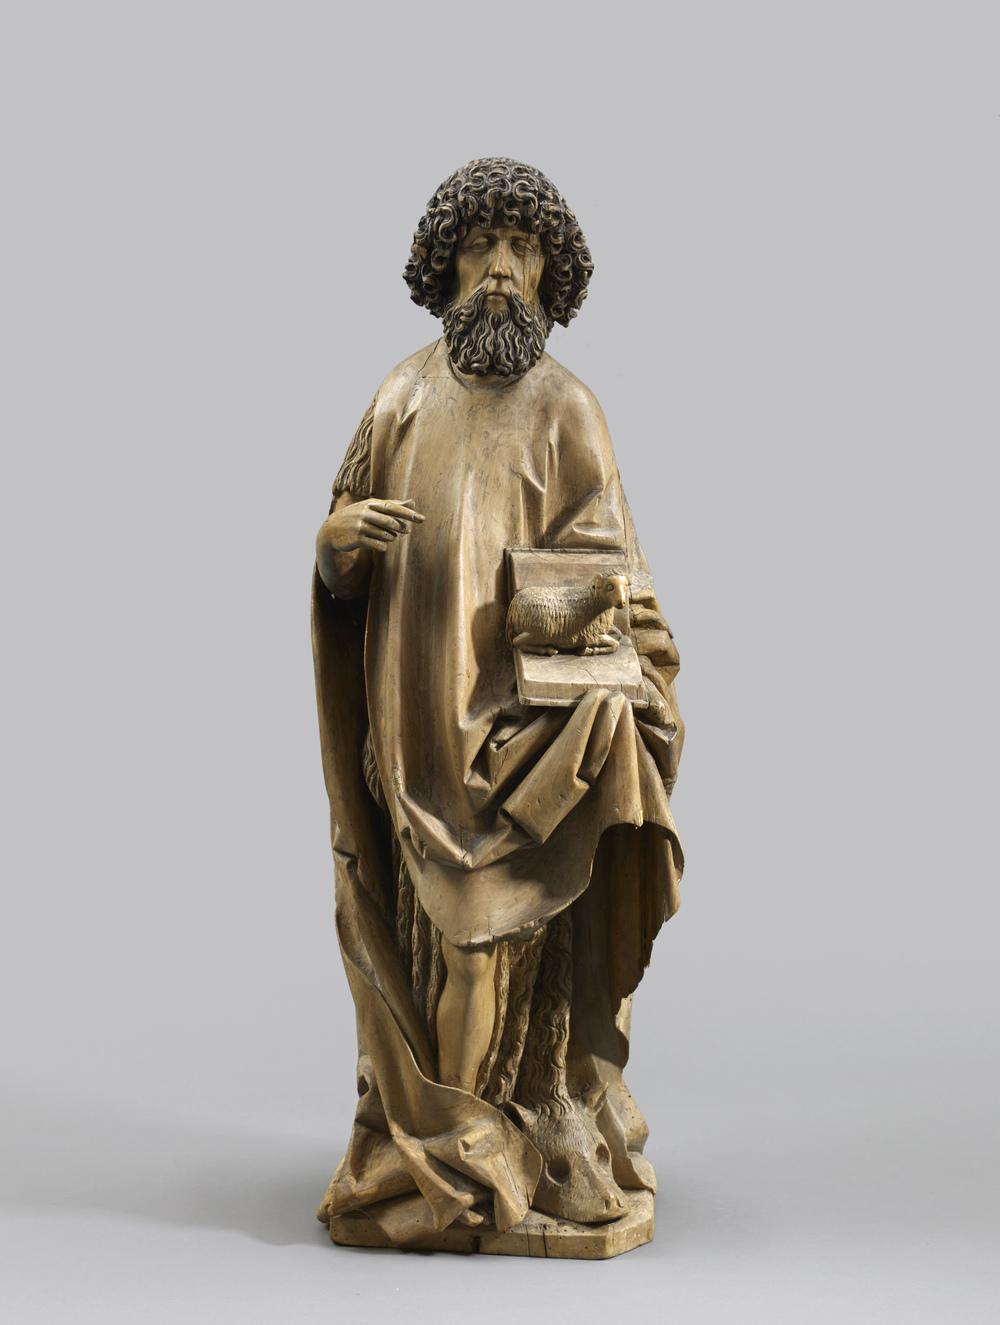 S  aint John the Baptist   Jörg Stein ( fl.  1453-1491)  Ulm, Baden-Würtemberg   c.  1480-1485  Height 92cm, limewood